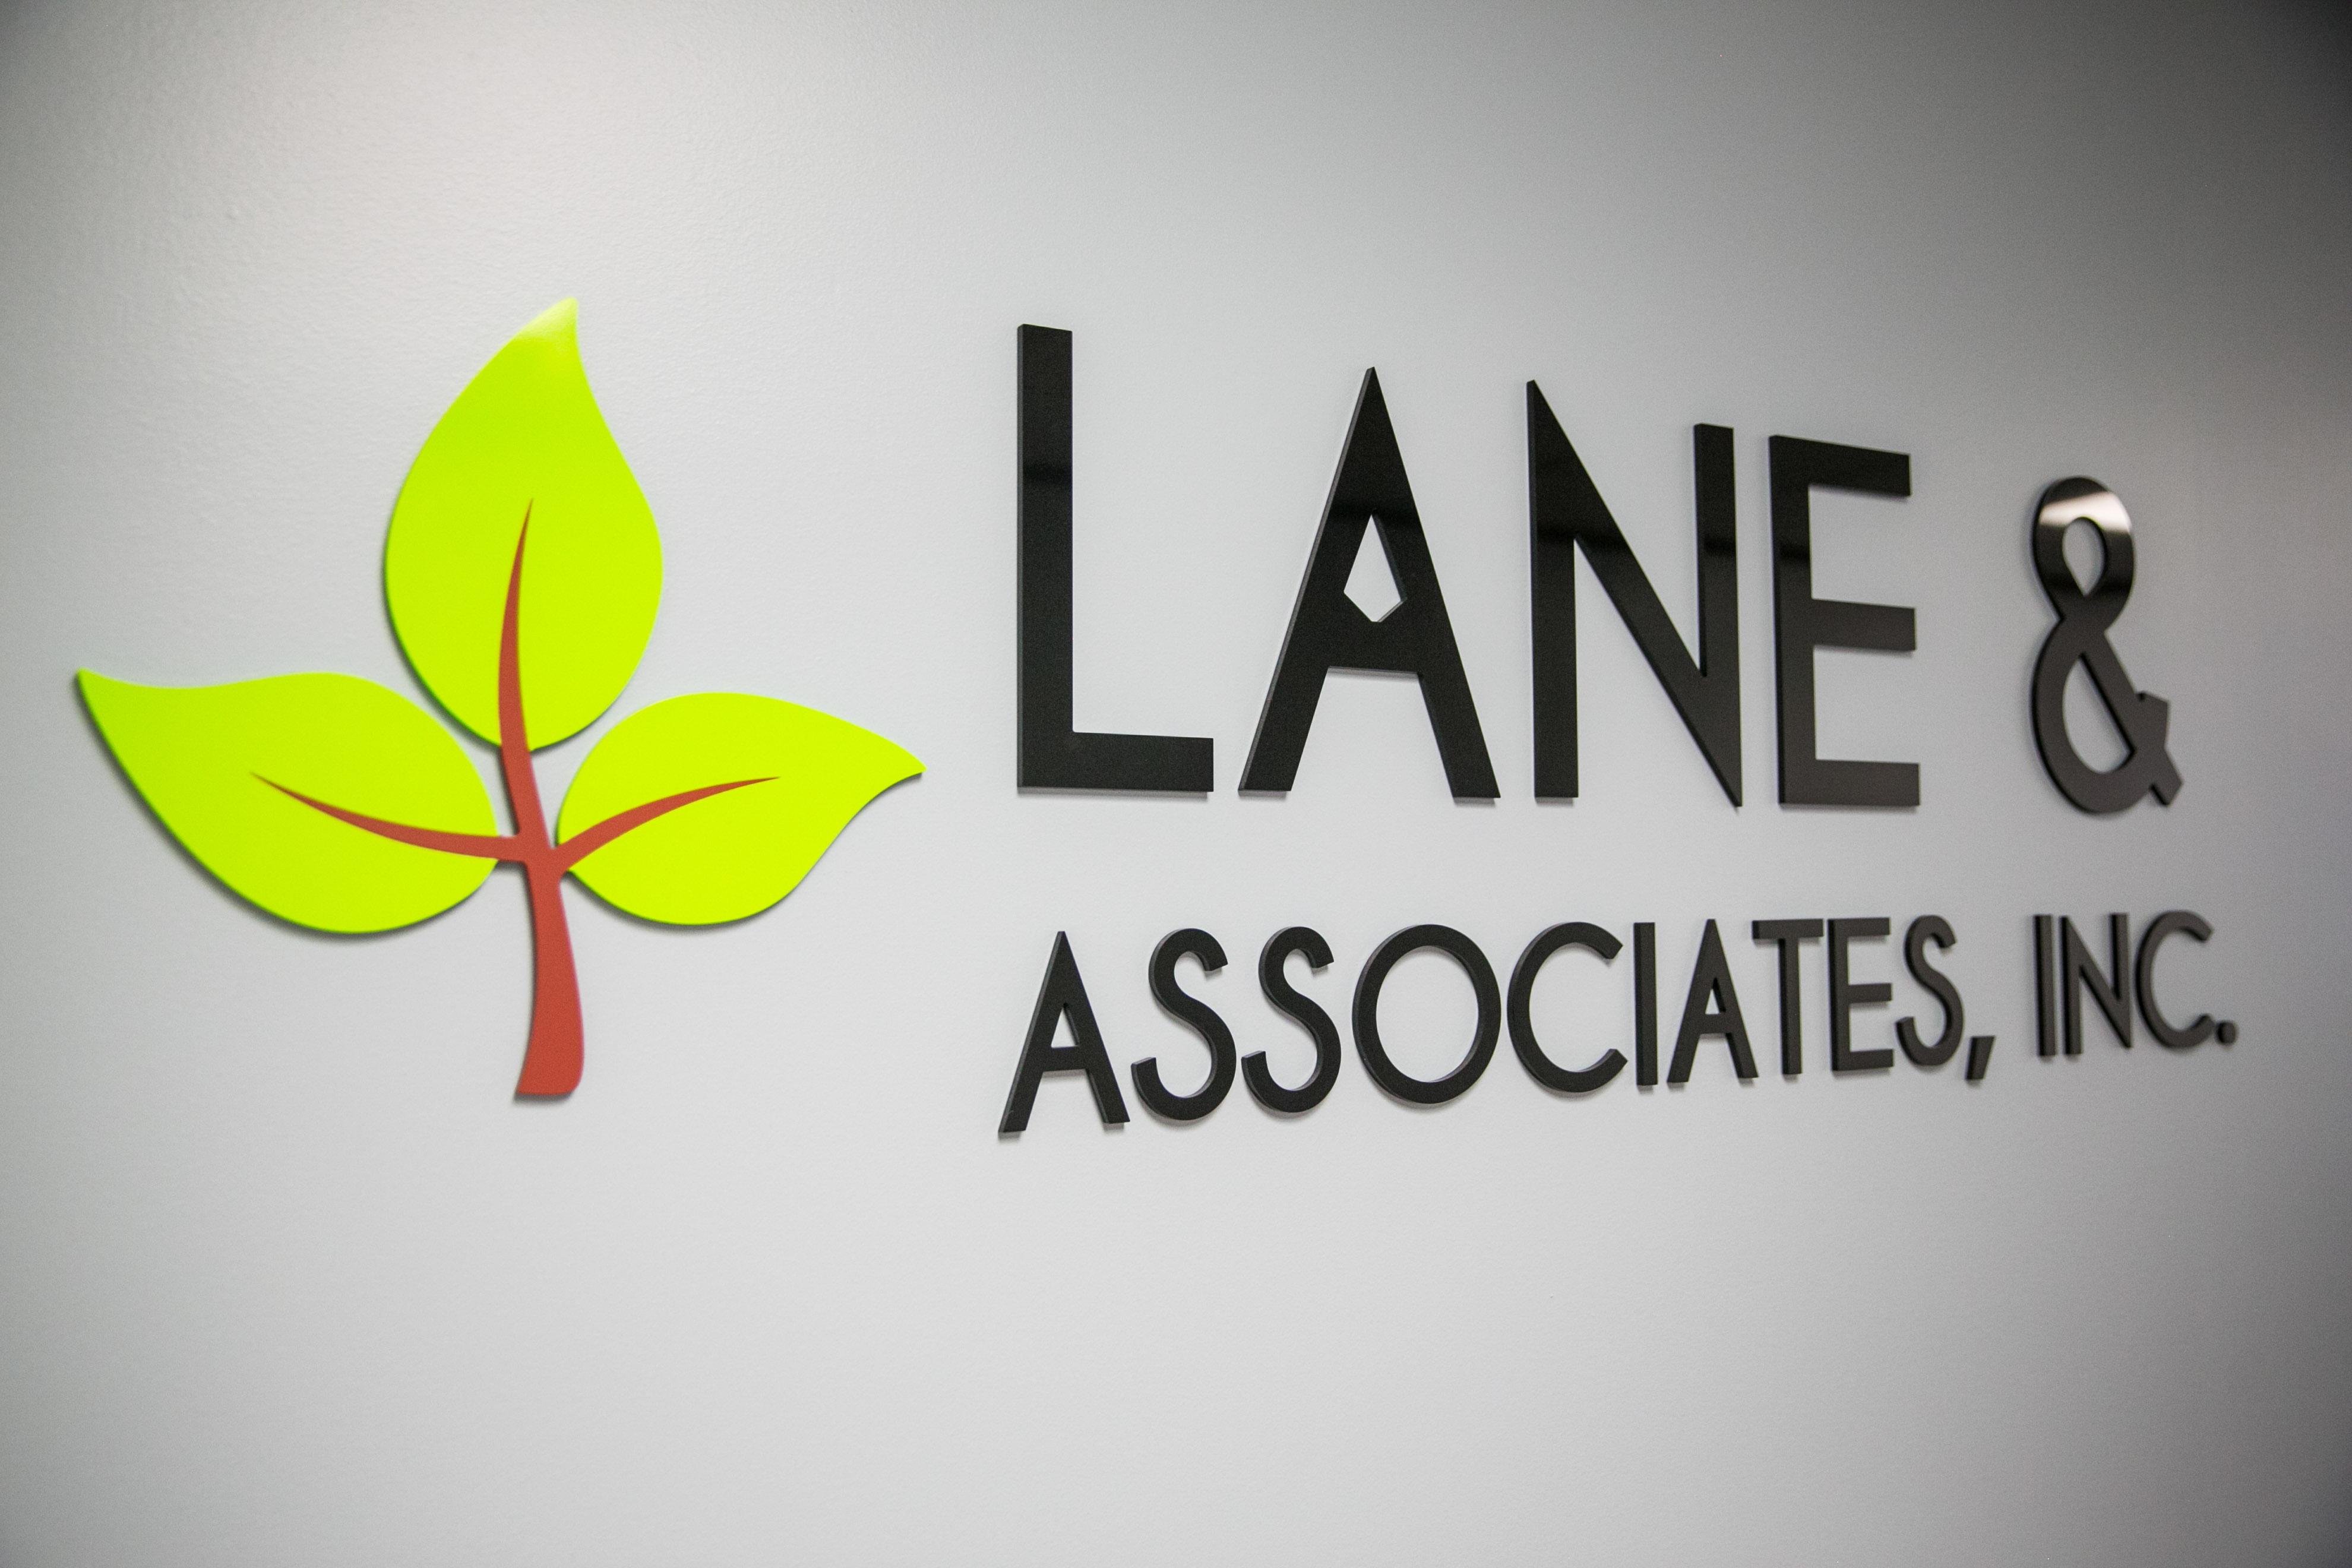 lane and associates